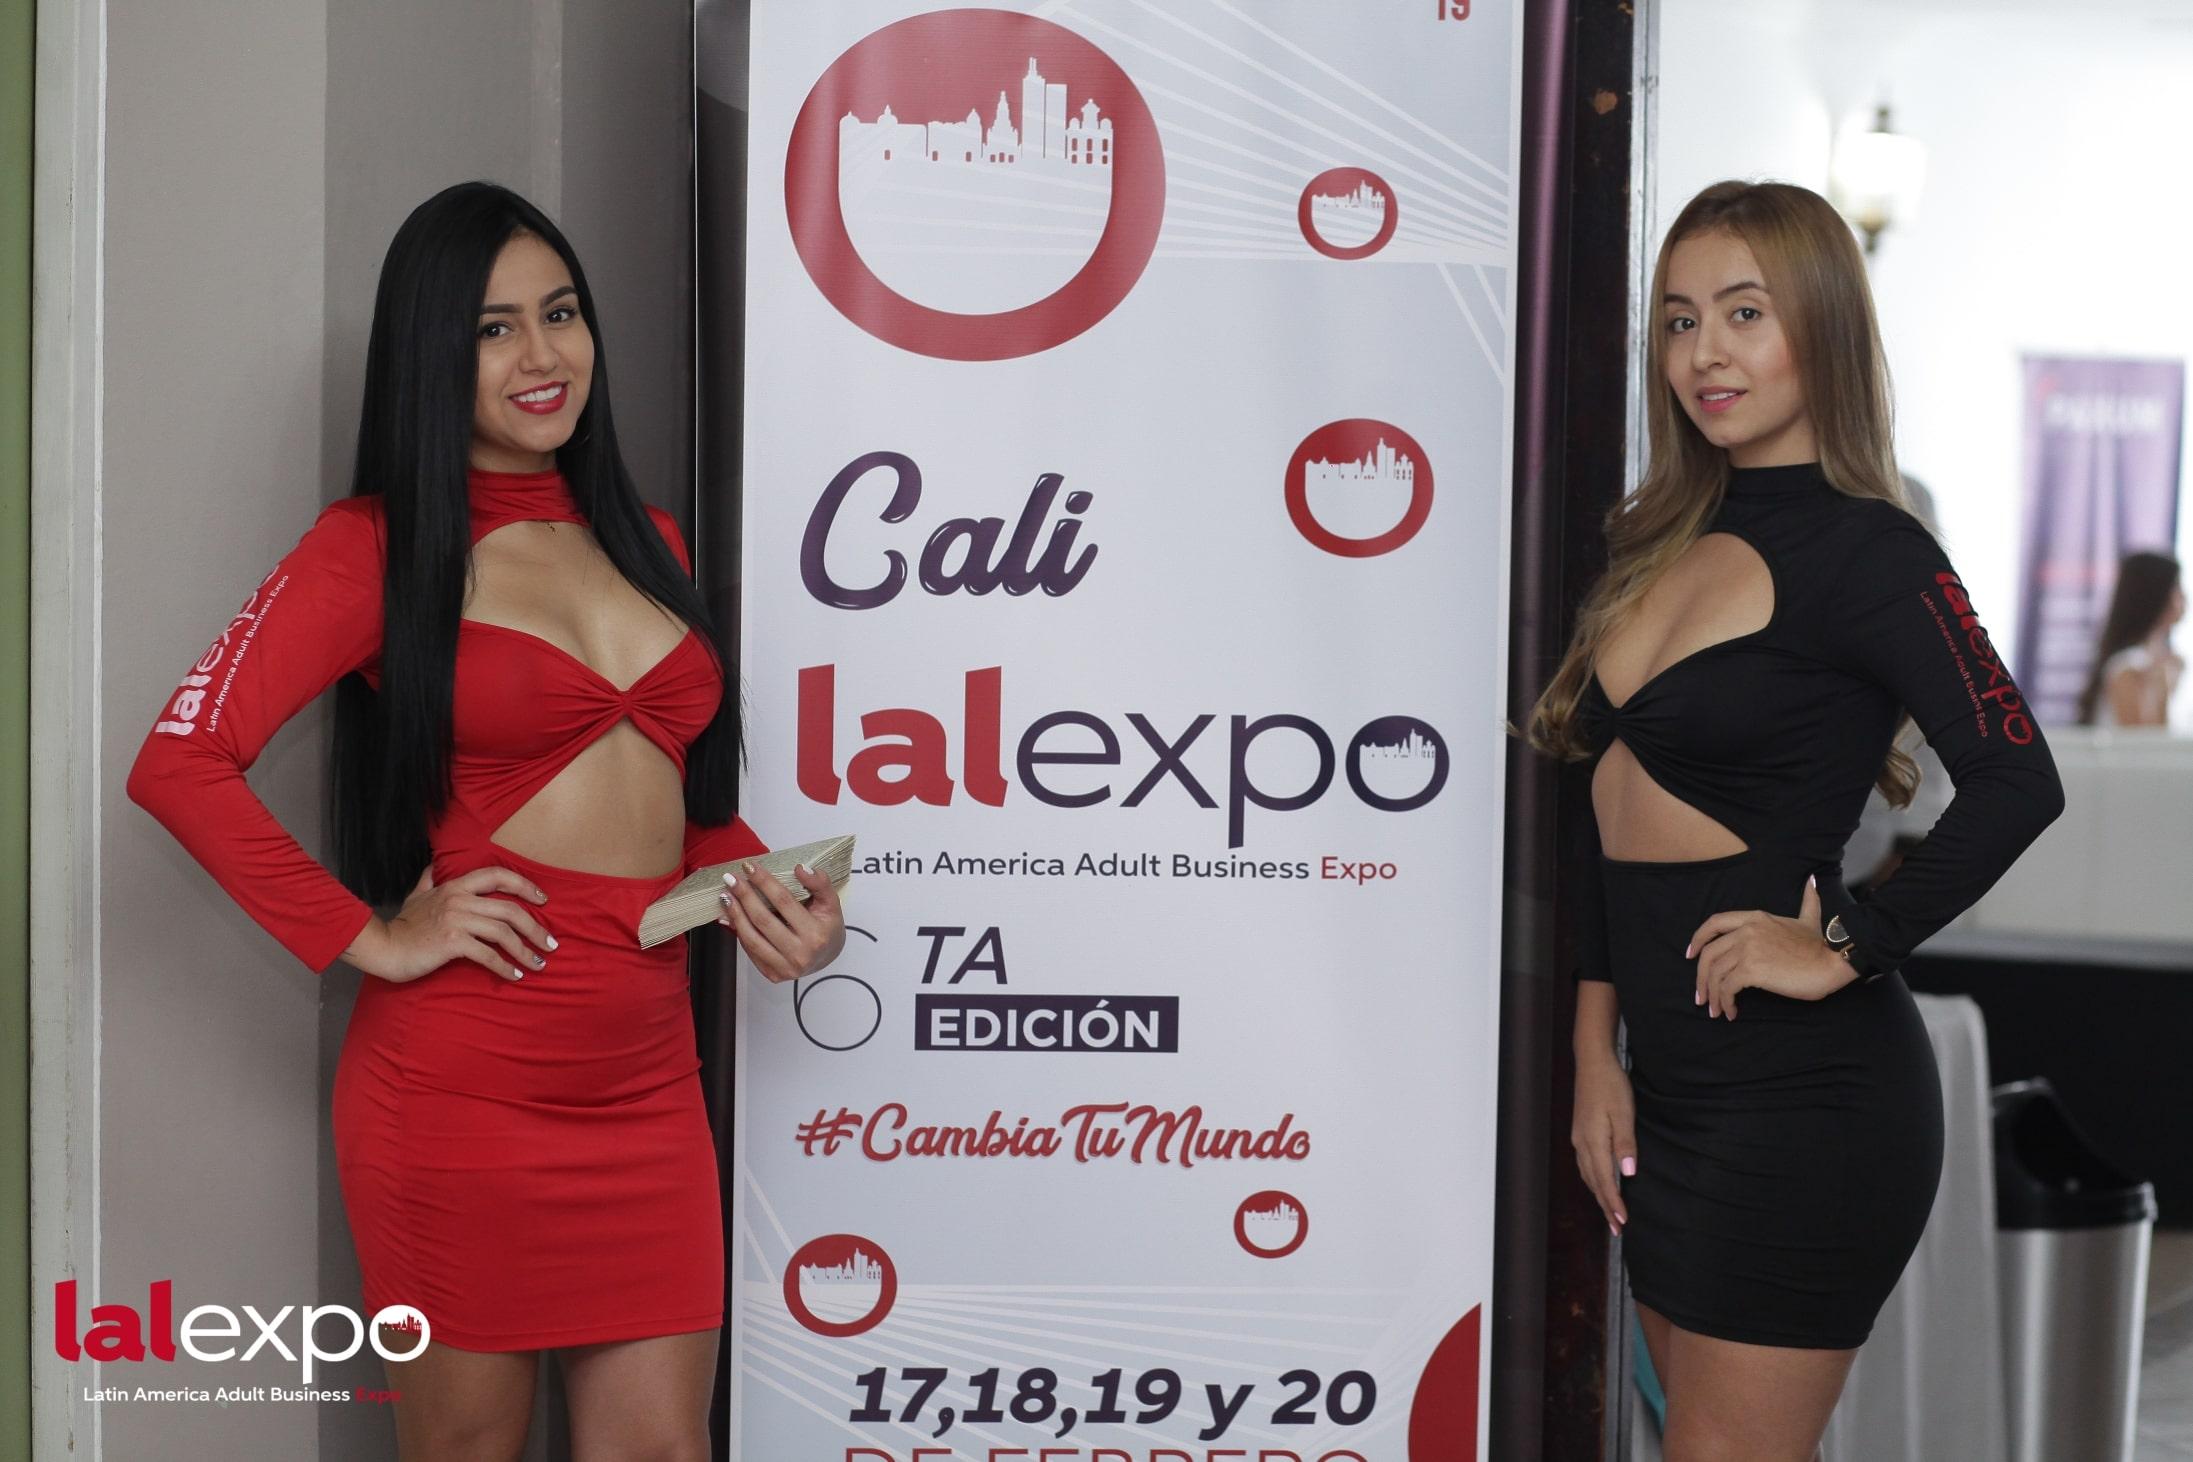 Lalexpo Cali 2019 Maju Studios